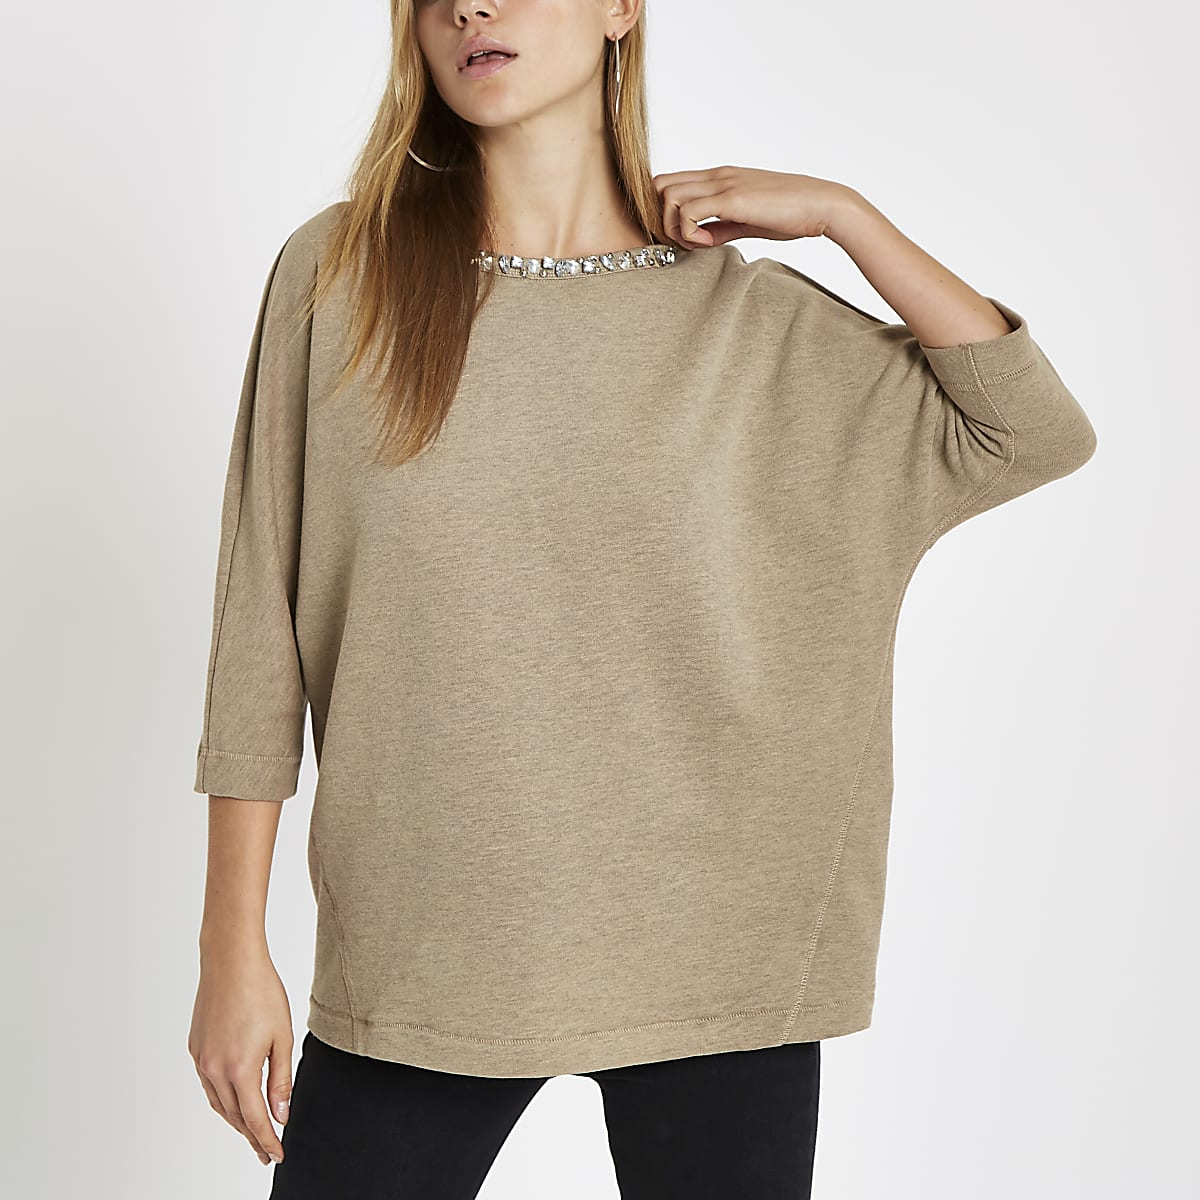 Verziertes Sweatshirt in Beige